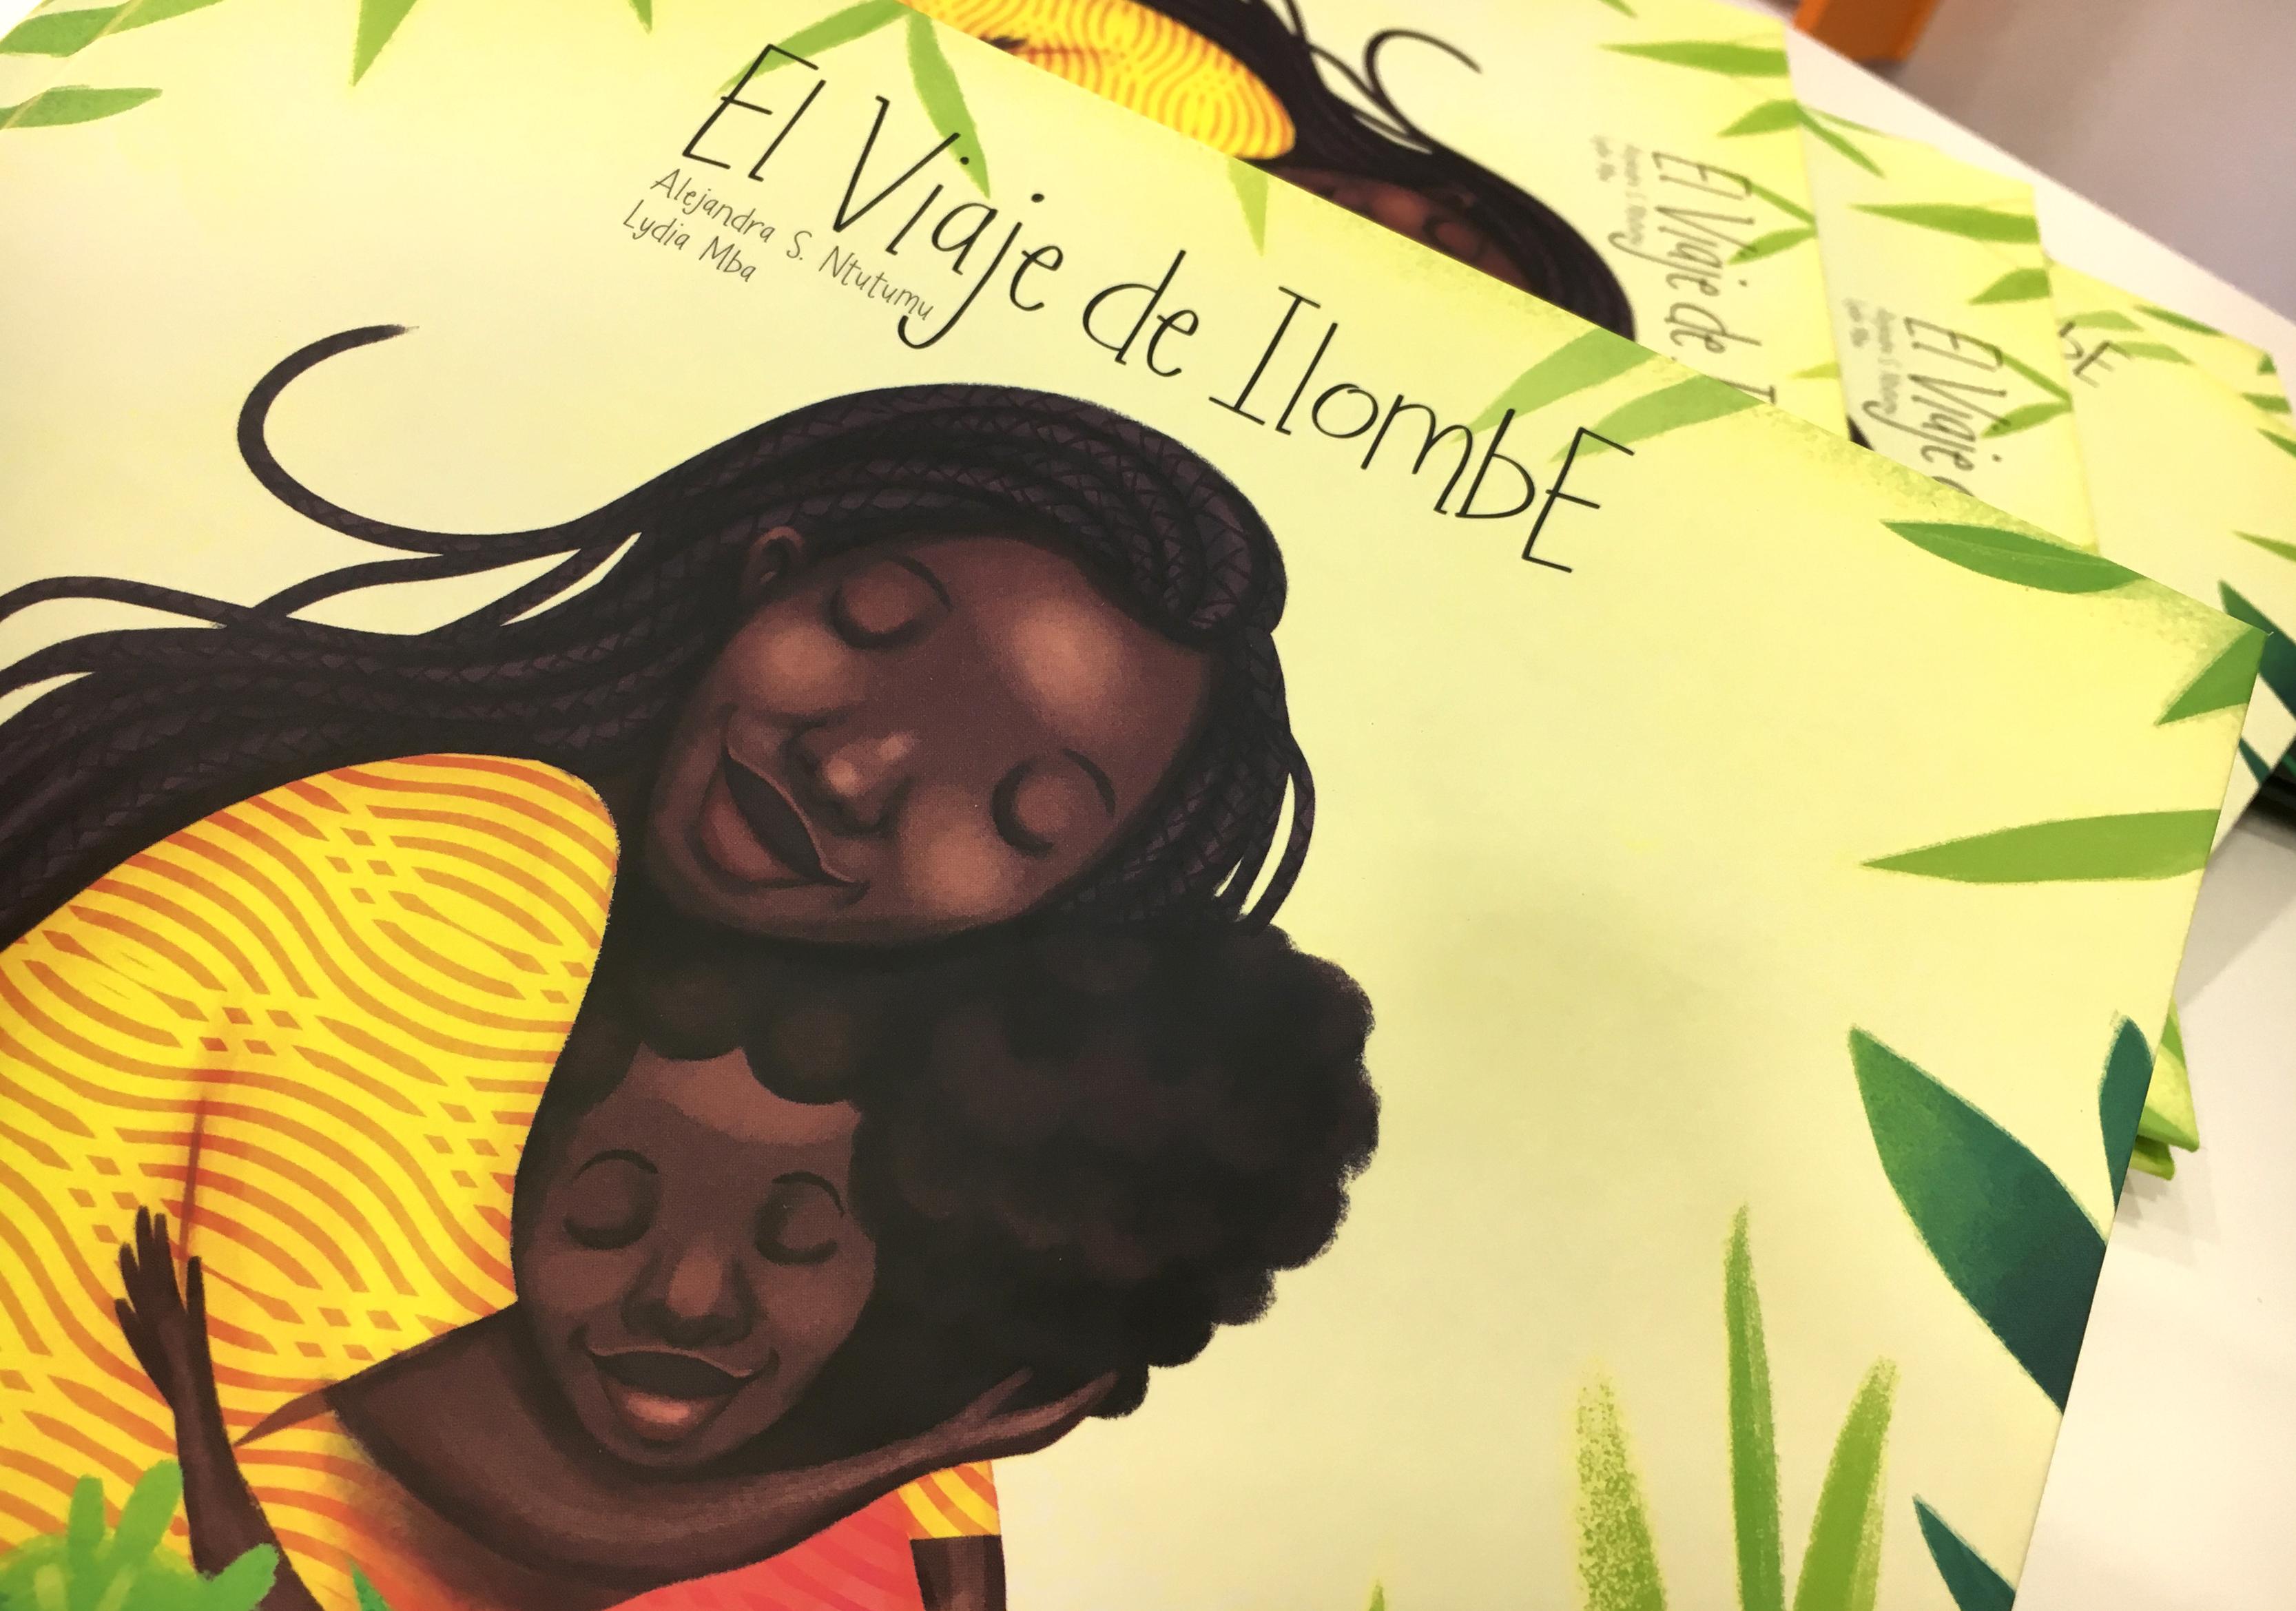 Potopoto Afrocuento El Viajede Ilombe